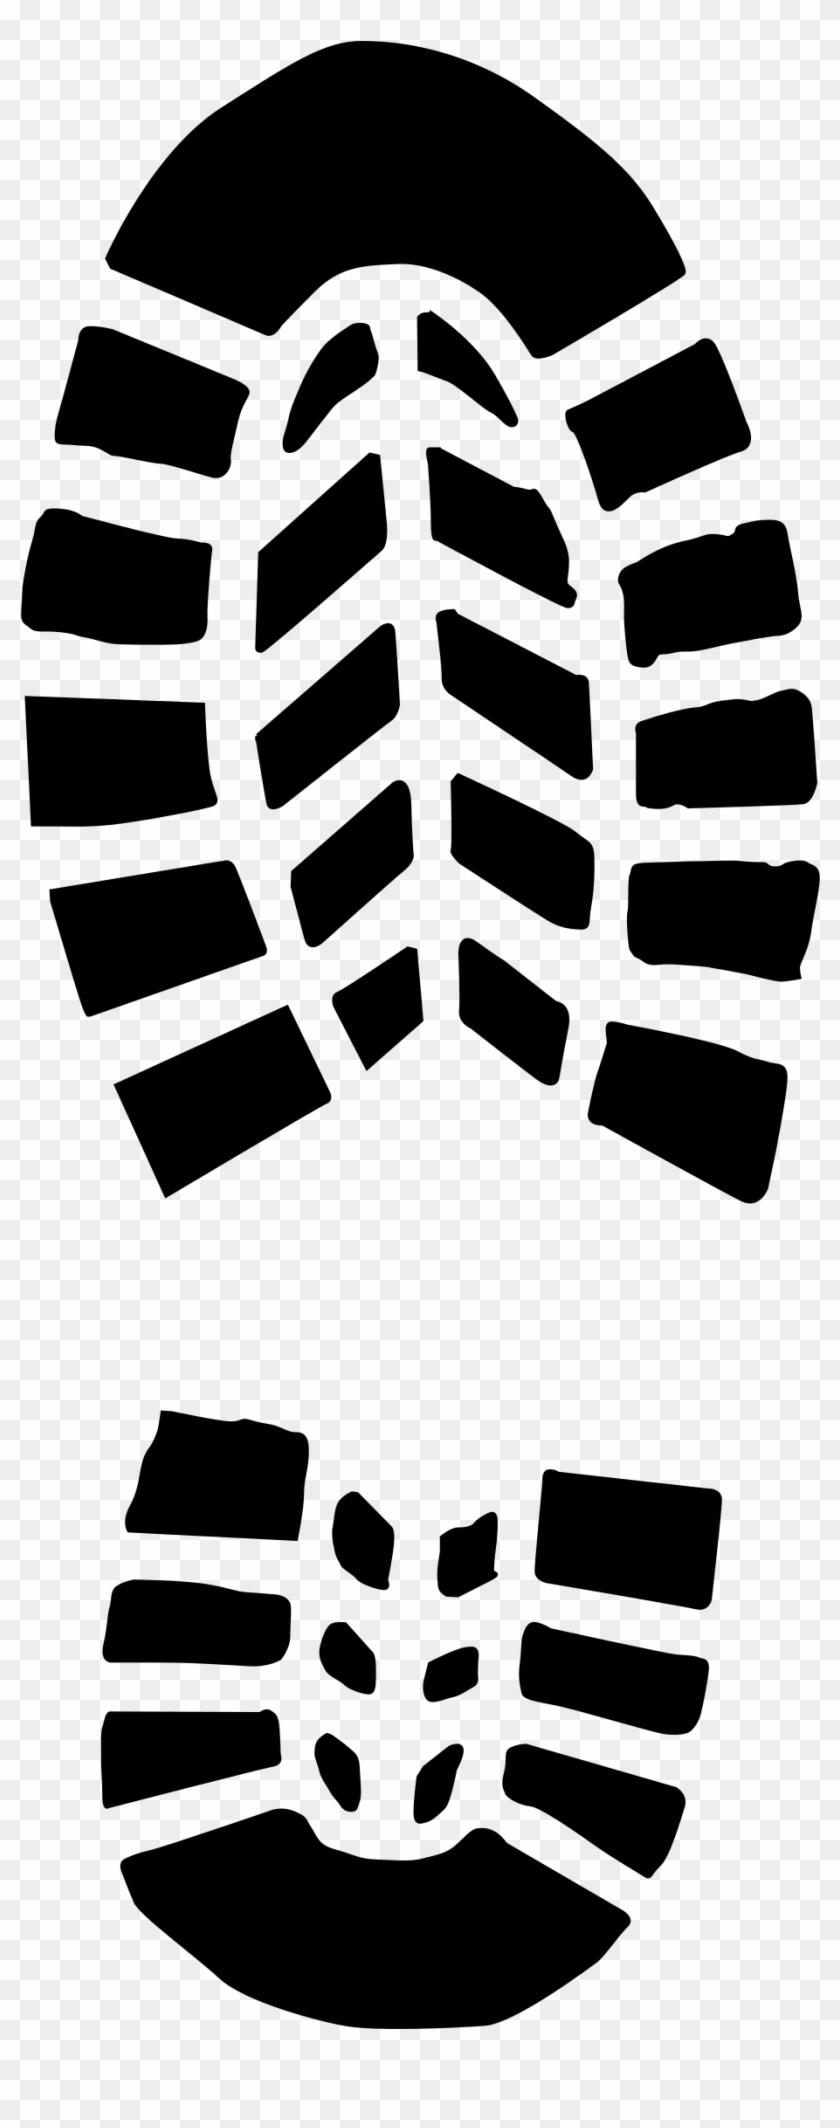 Boot Print Clip Art At Clker - Boot Print Clipart #26492